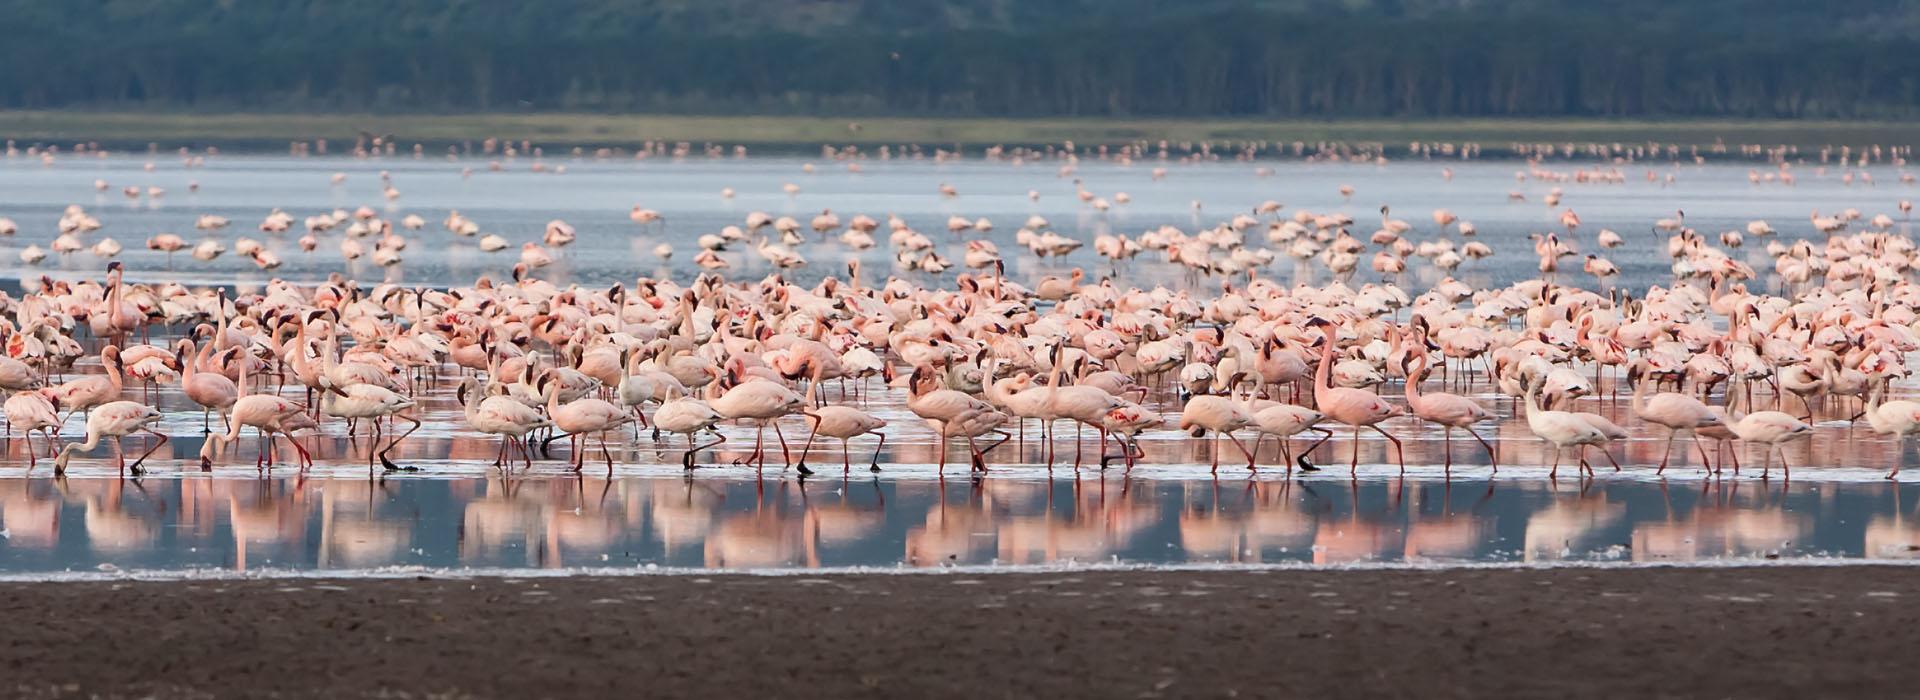 African Adventure Specialists - Lake Bogoria NATIONAL PARK Destination